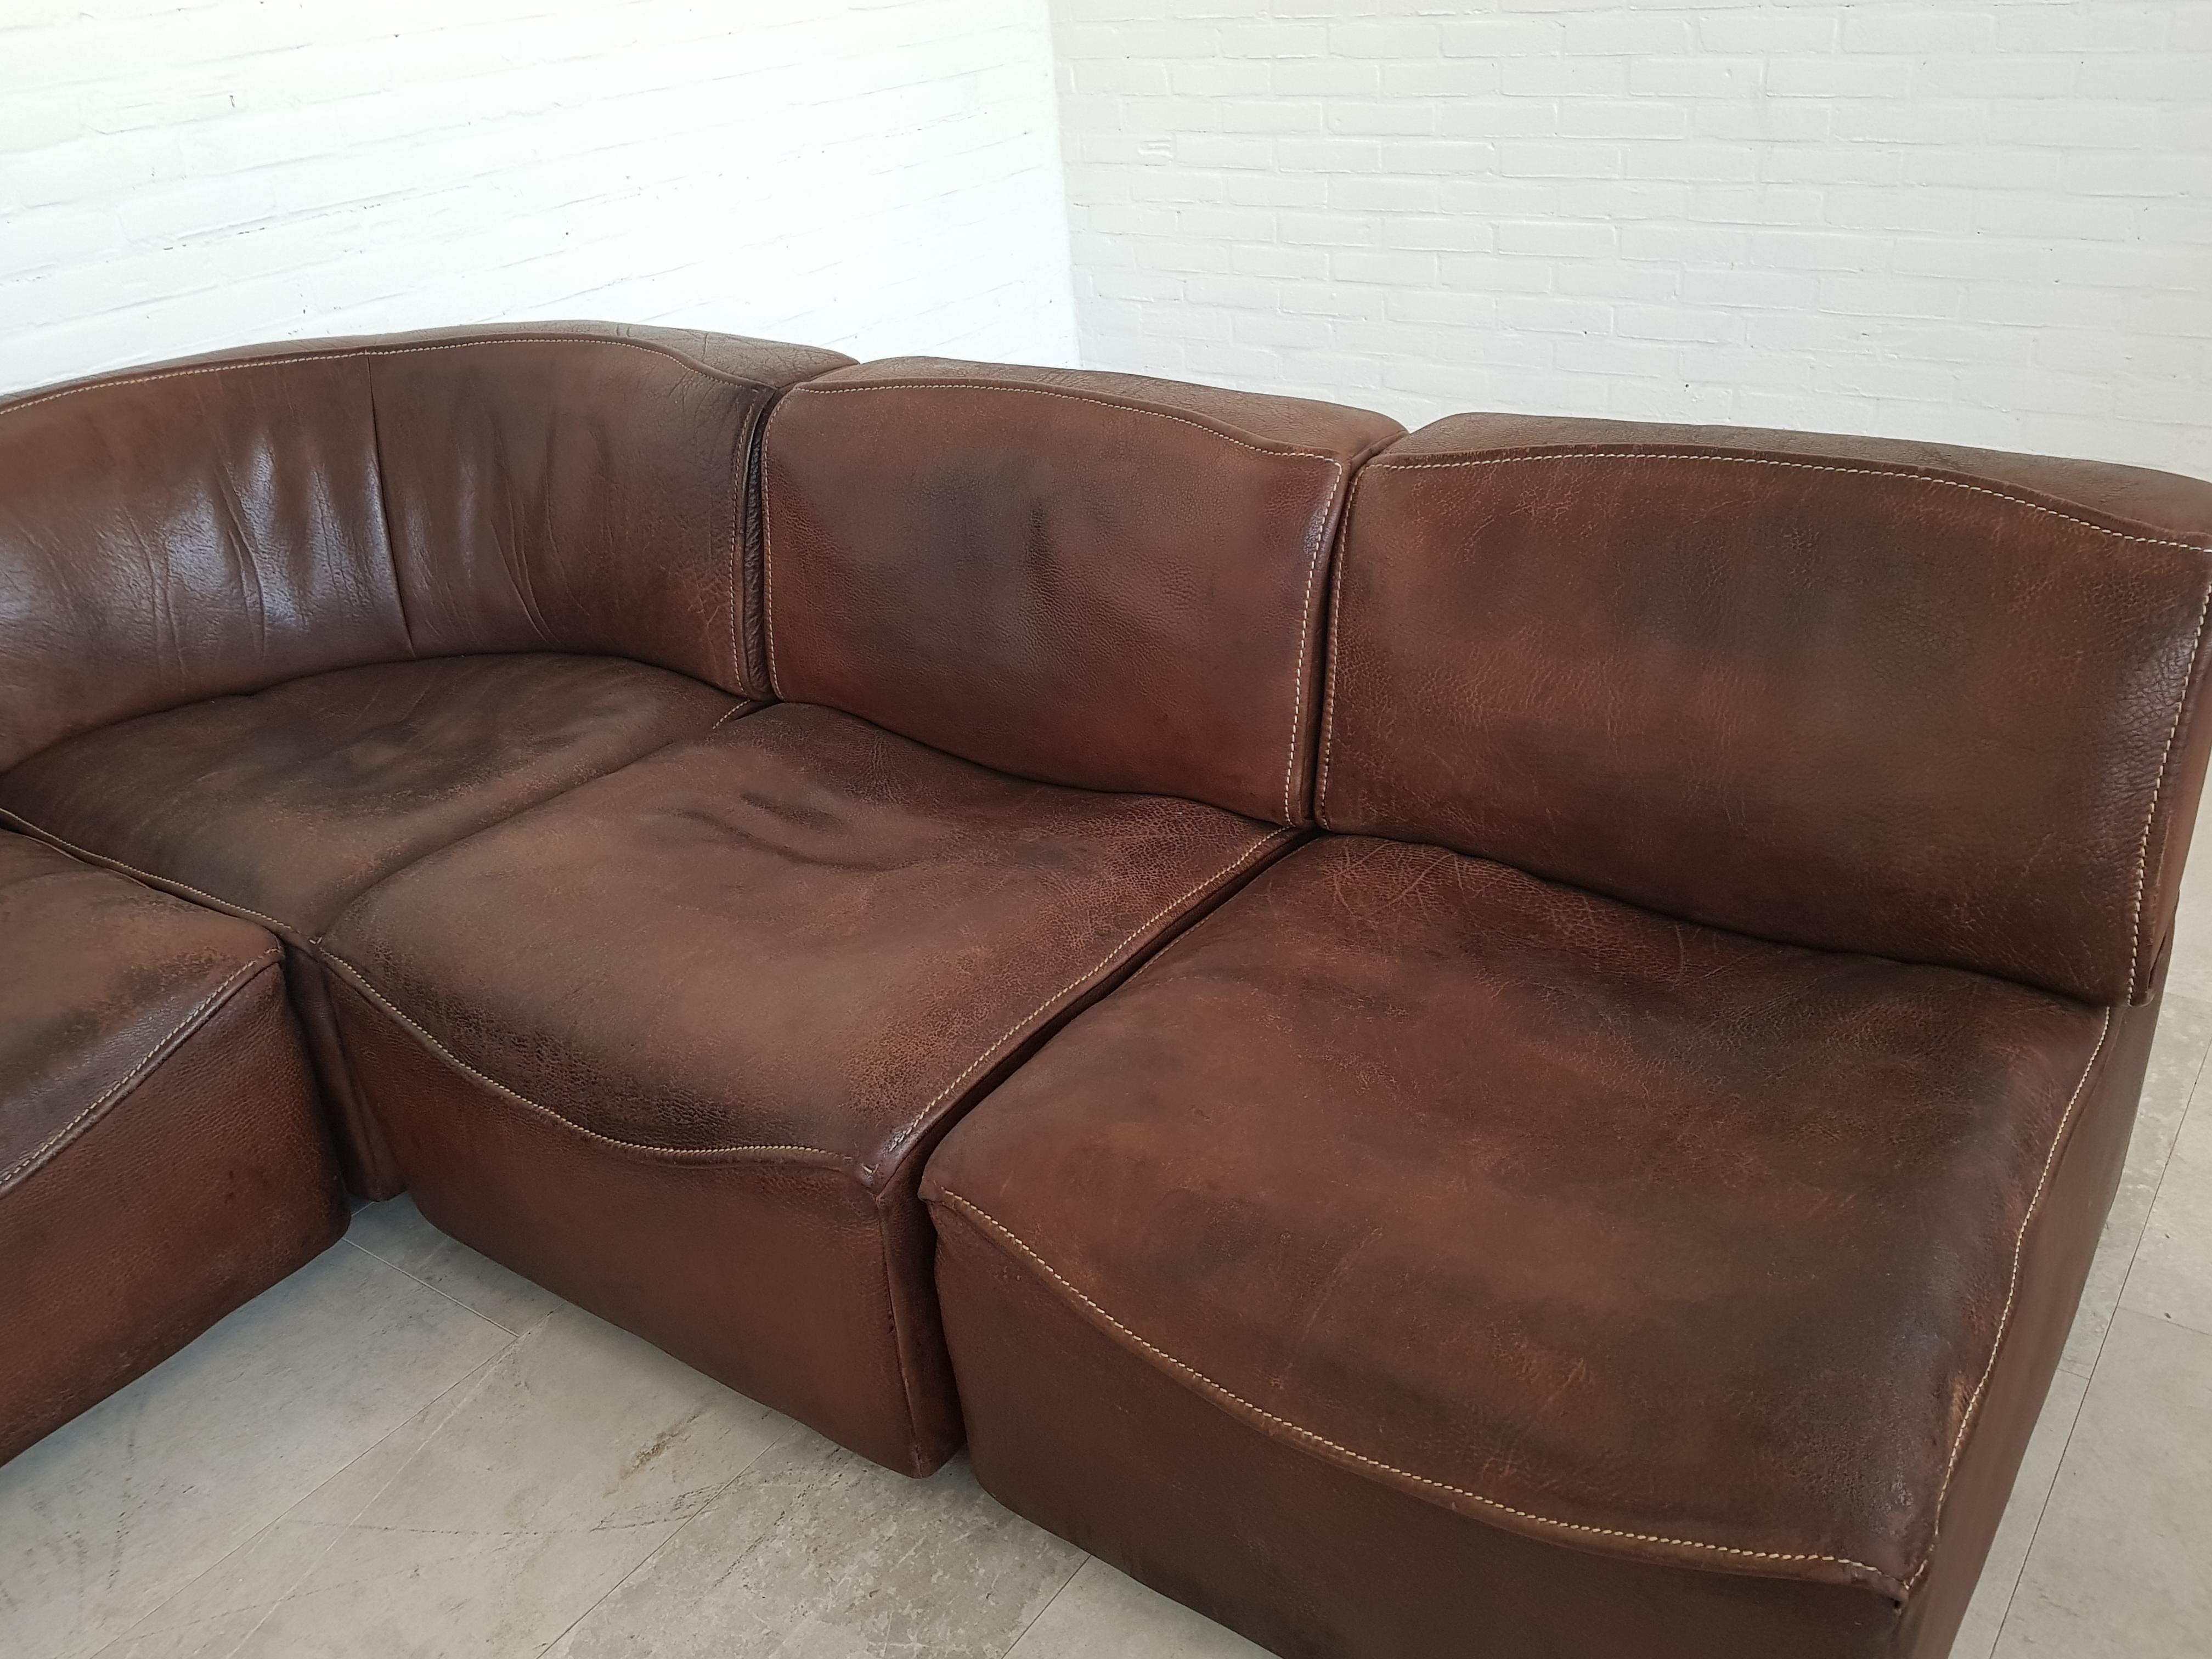 Pleasing De Sede Ds15 Sectional Sofa 1970S Sitonvintage Creativecarmelina Interior Chair Design Creativecarmelinacom